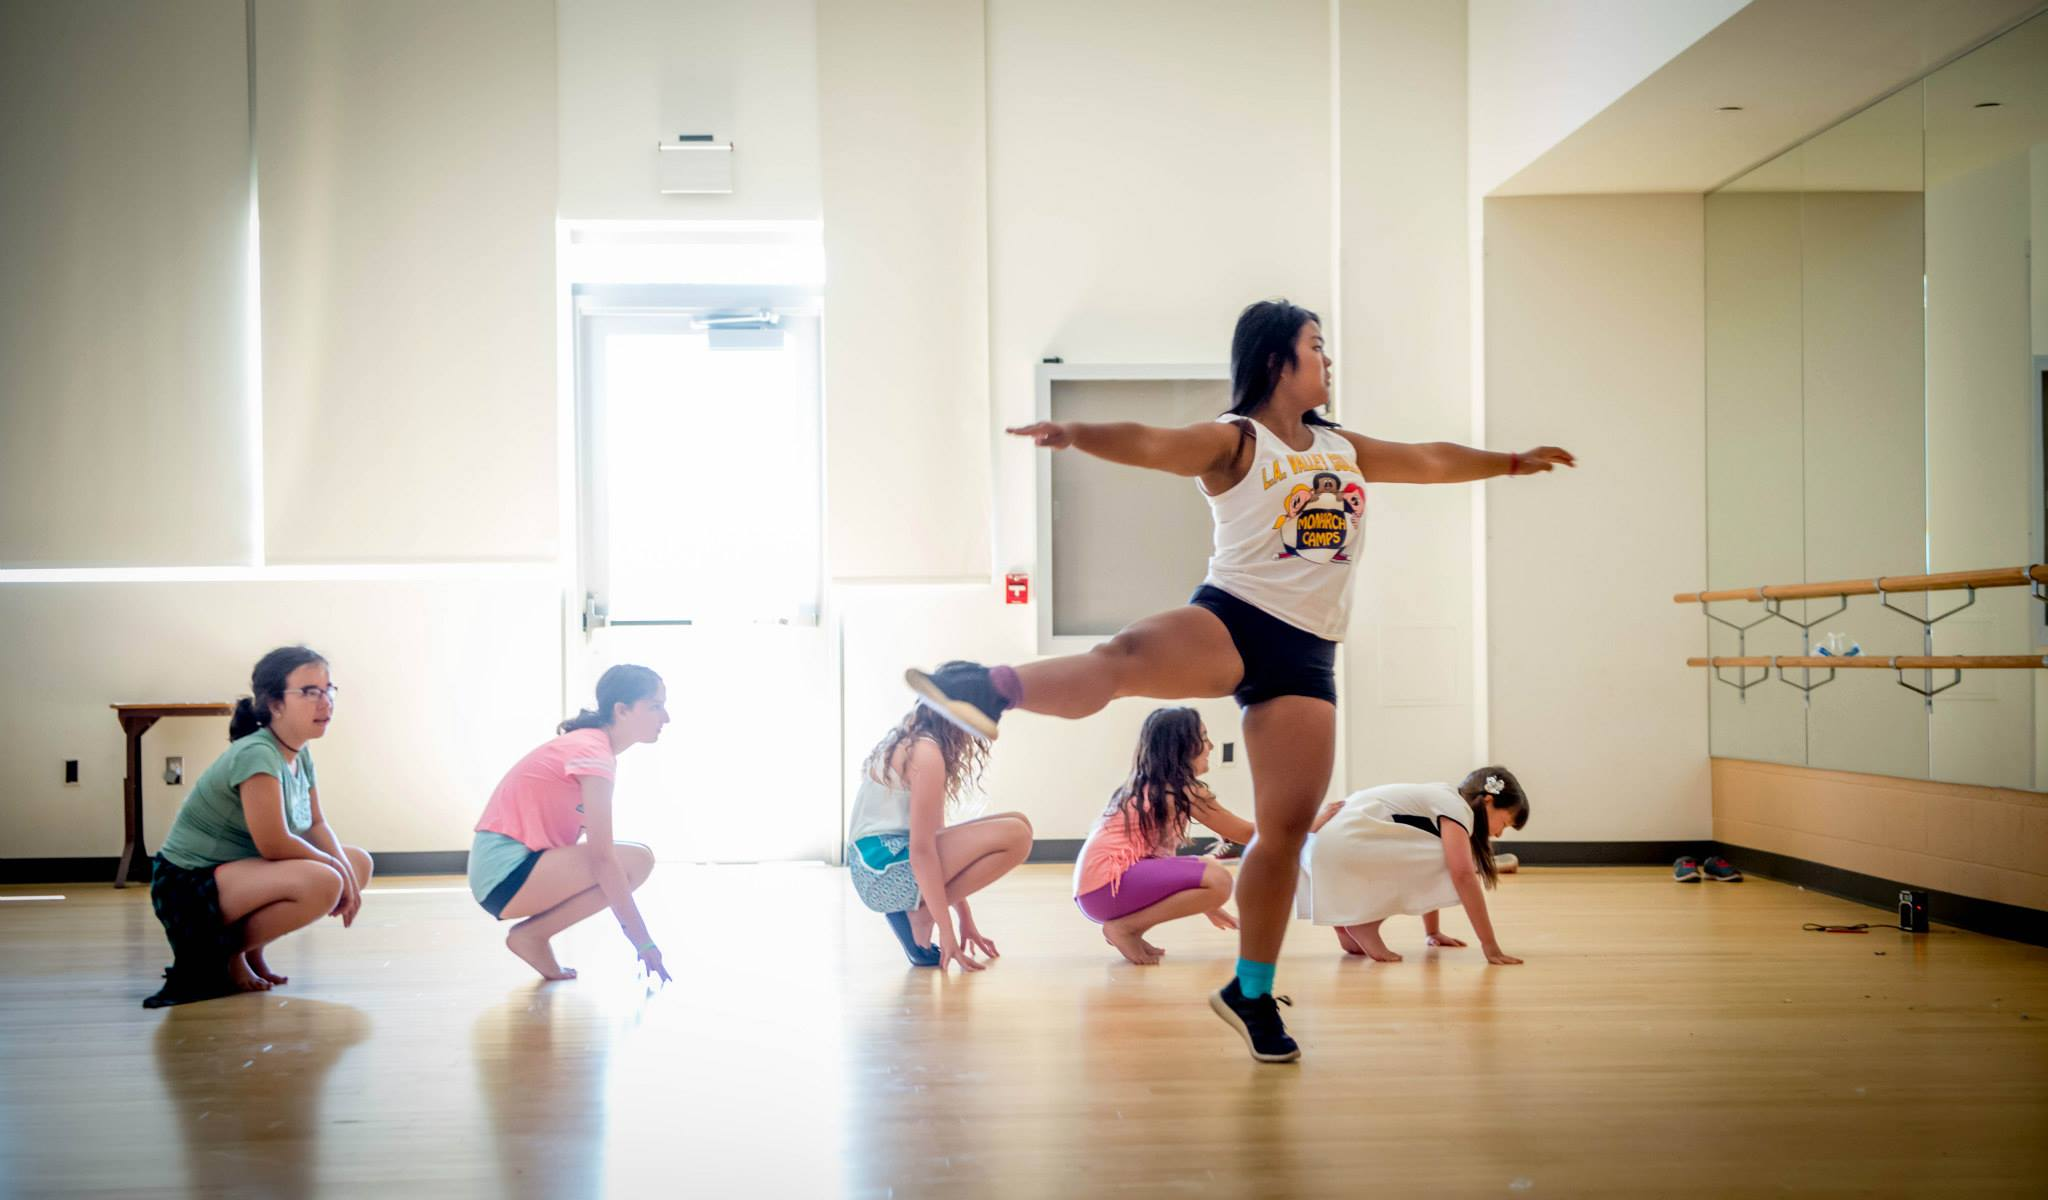 https://monarchcamps.com/wp-content/uploads/2018/01/dance-camp-for-children-in-los-angeles-summer-day-camp-children-dancing-in-dance-studio.jpg